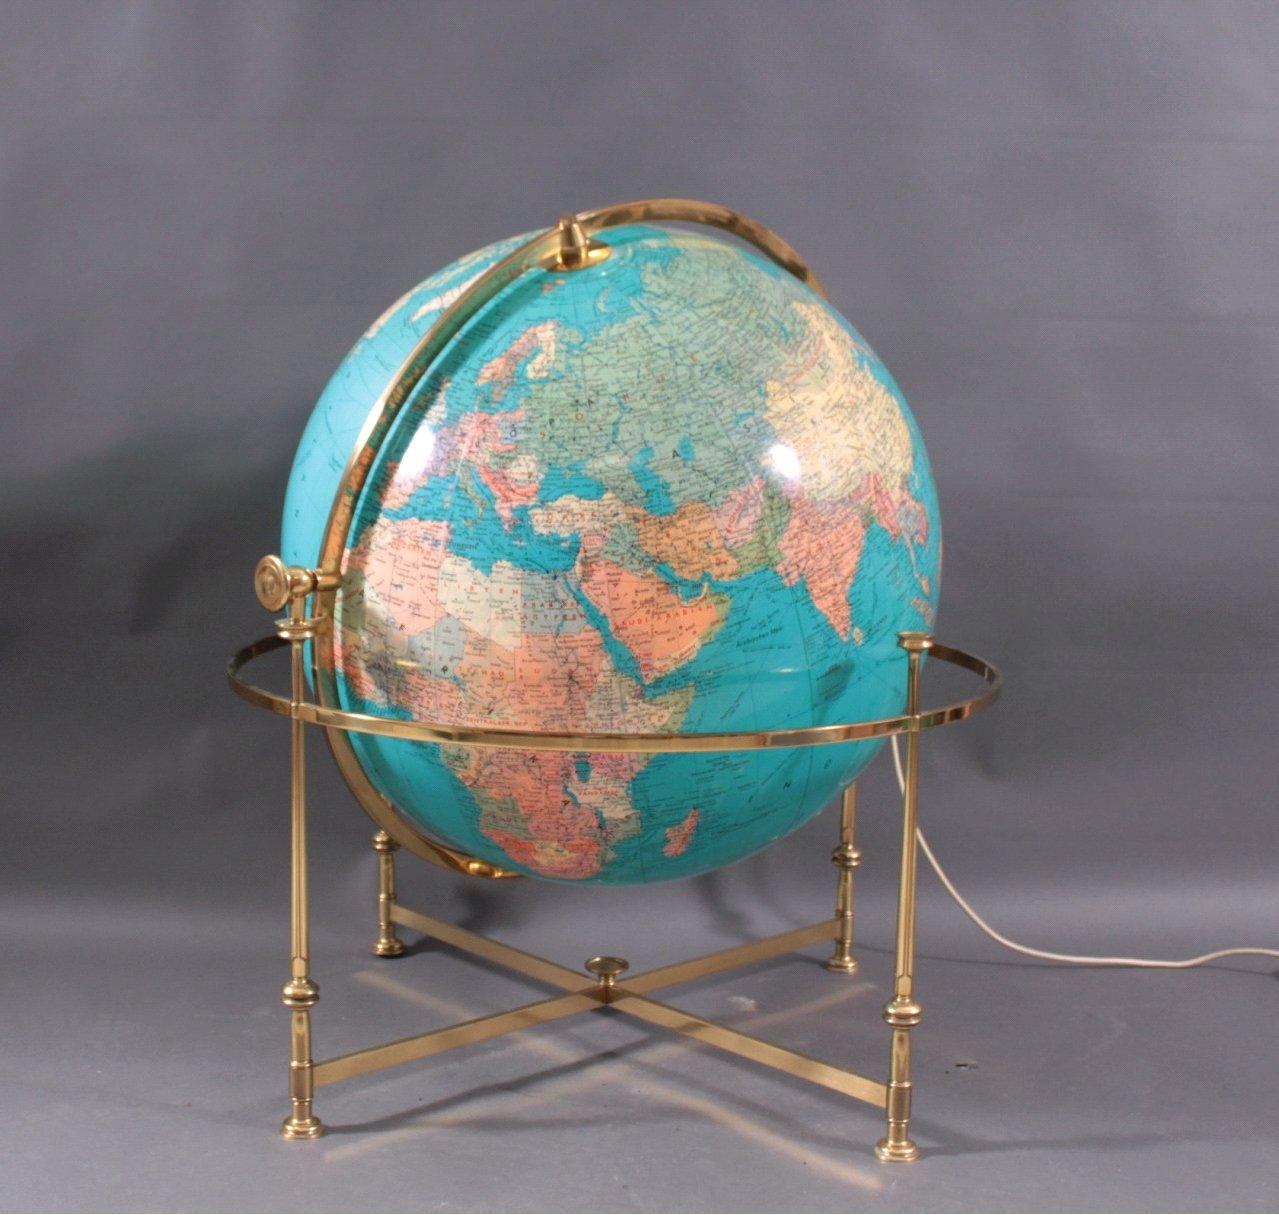 Vintage Globus aus Acryl von JRO, 1976